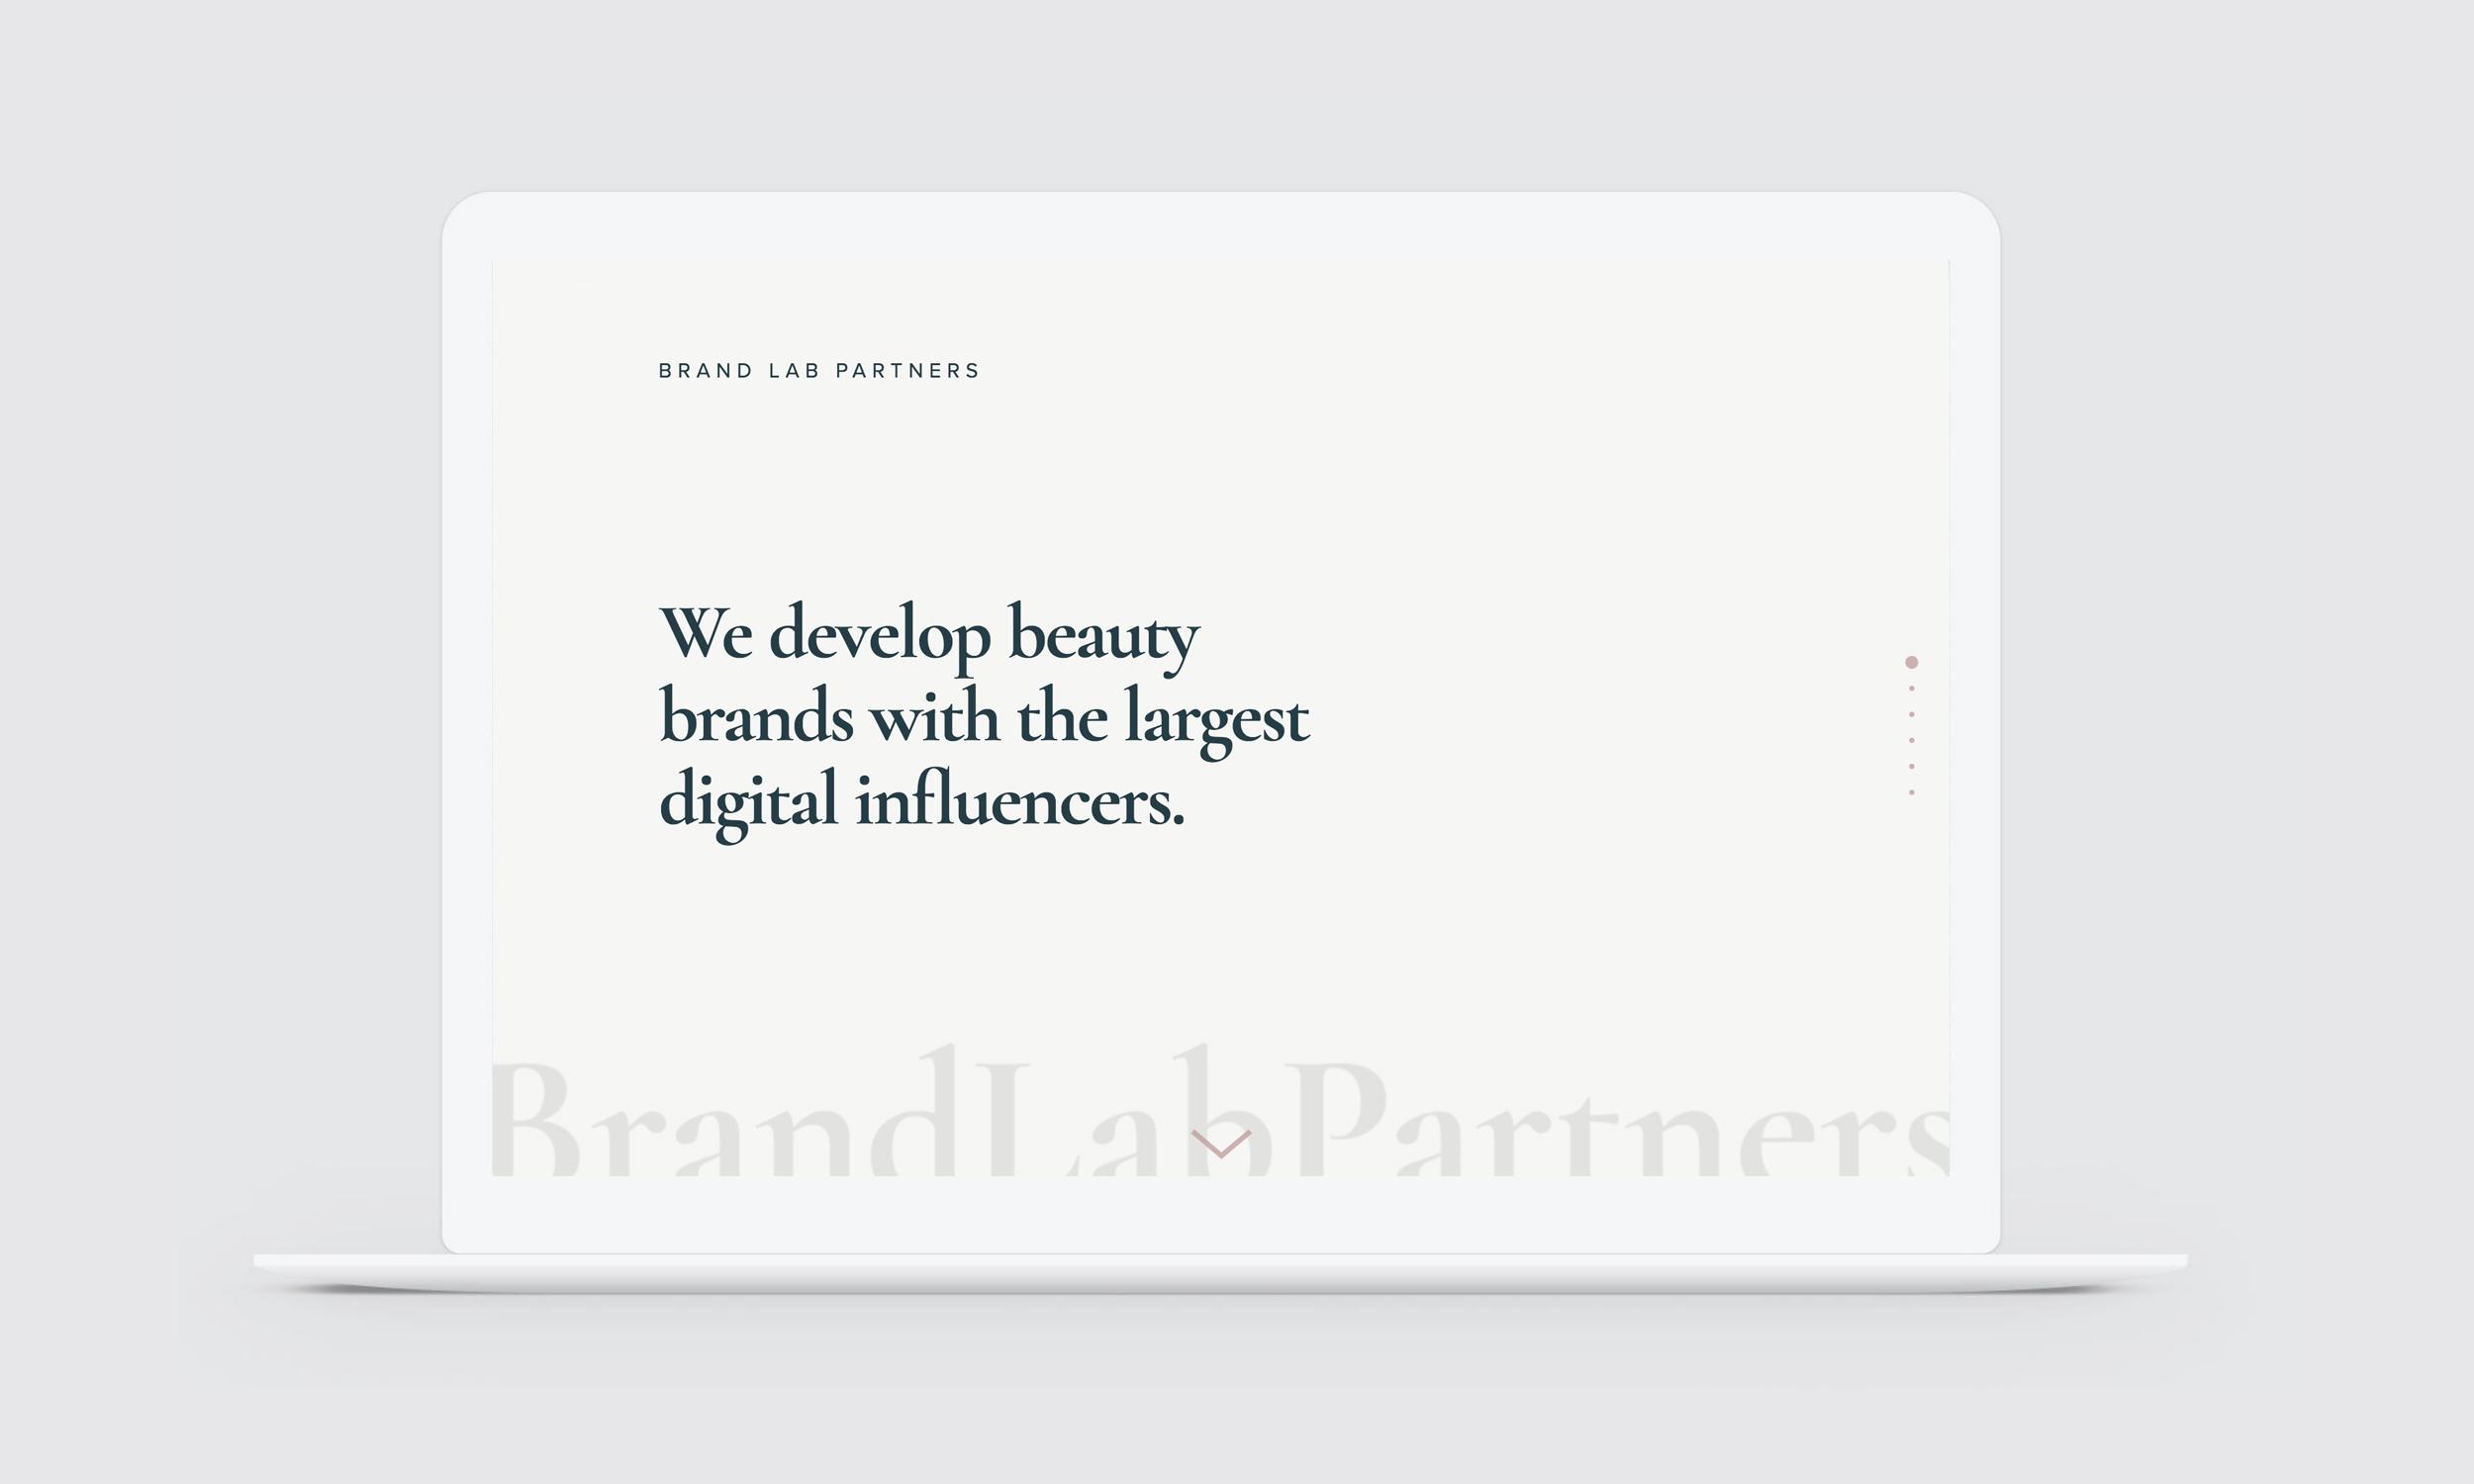 Brand Lab Partners website by Candy Black.jpg